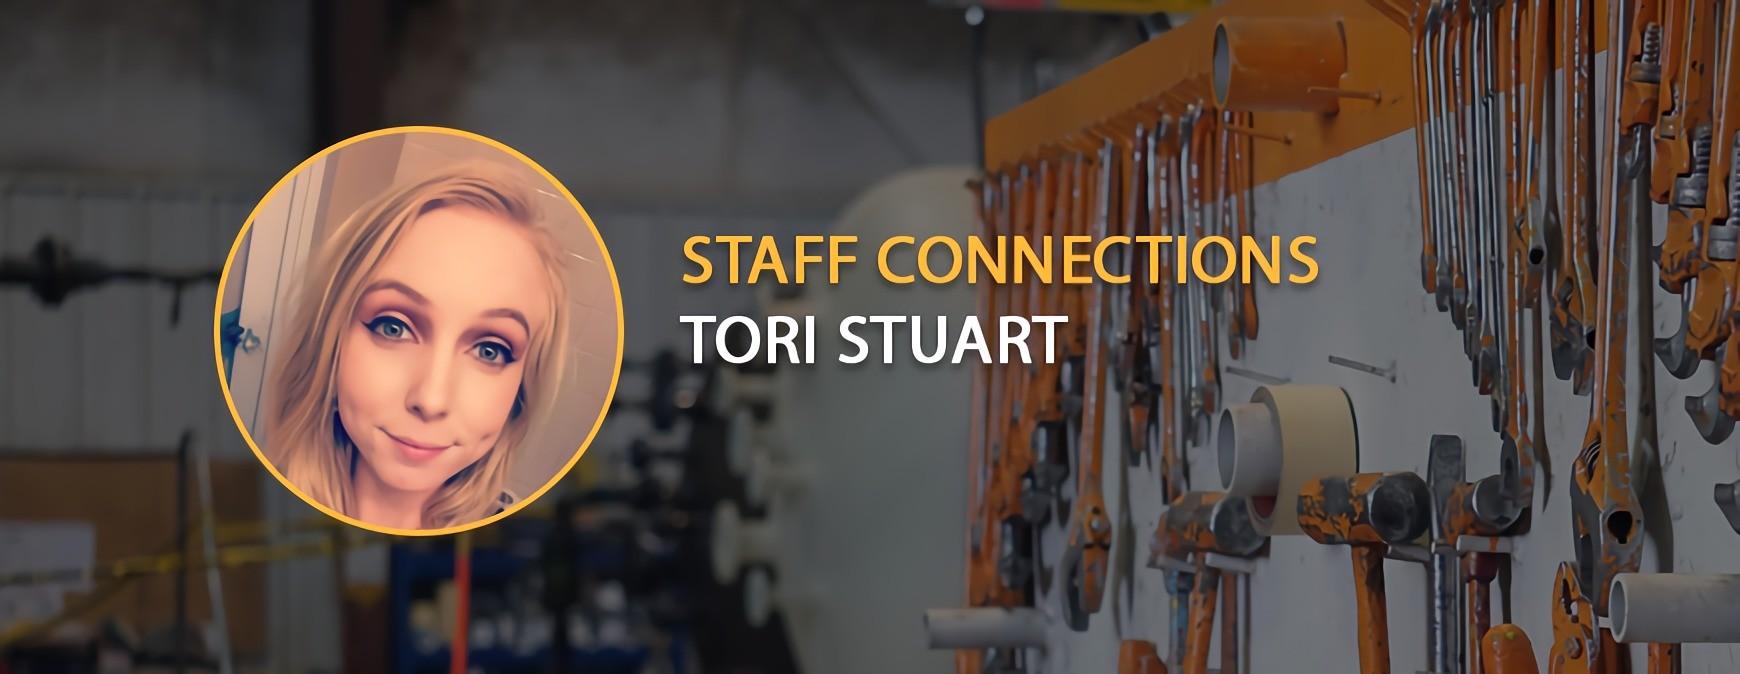 Tori Stuart Staff Connections